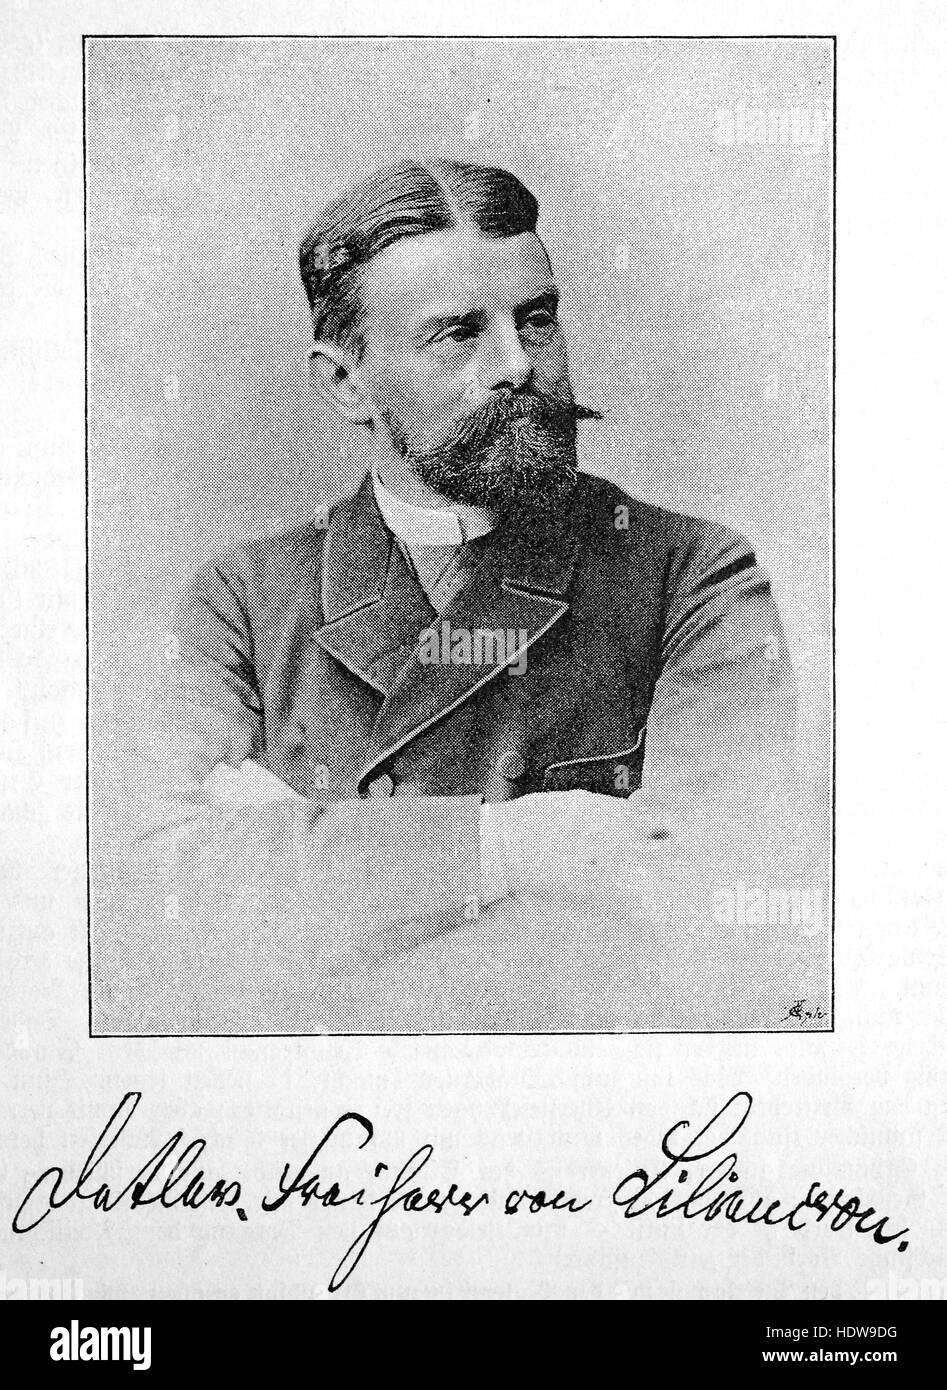 Baron Detlev von Liliencron born Friedrich Adolf Axel Detlev Liliencron, 1844-1909, German lyric poet and novelist - Stock Image